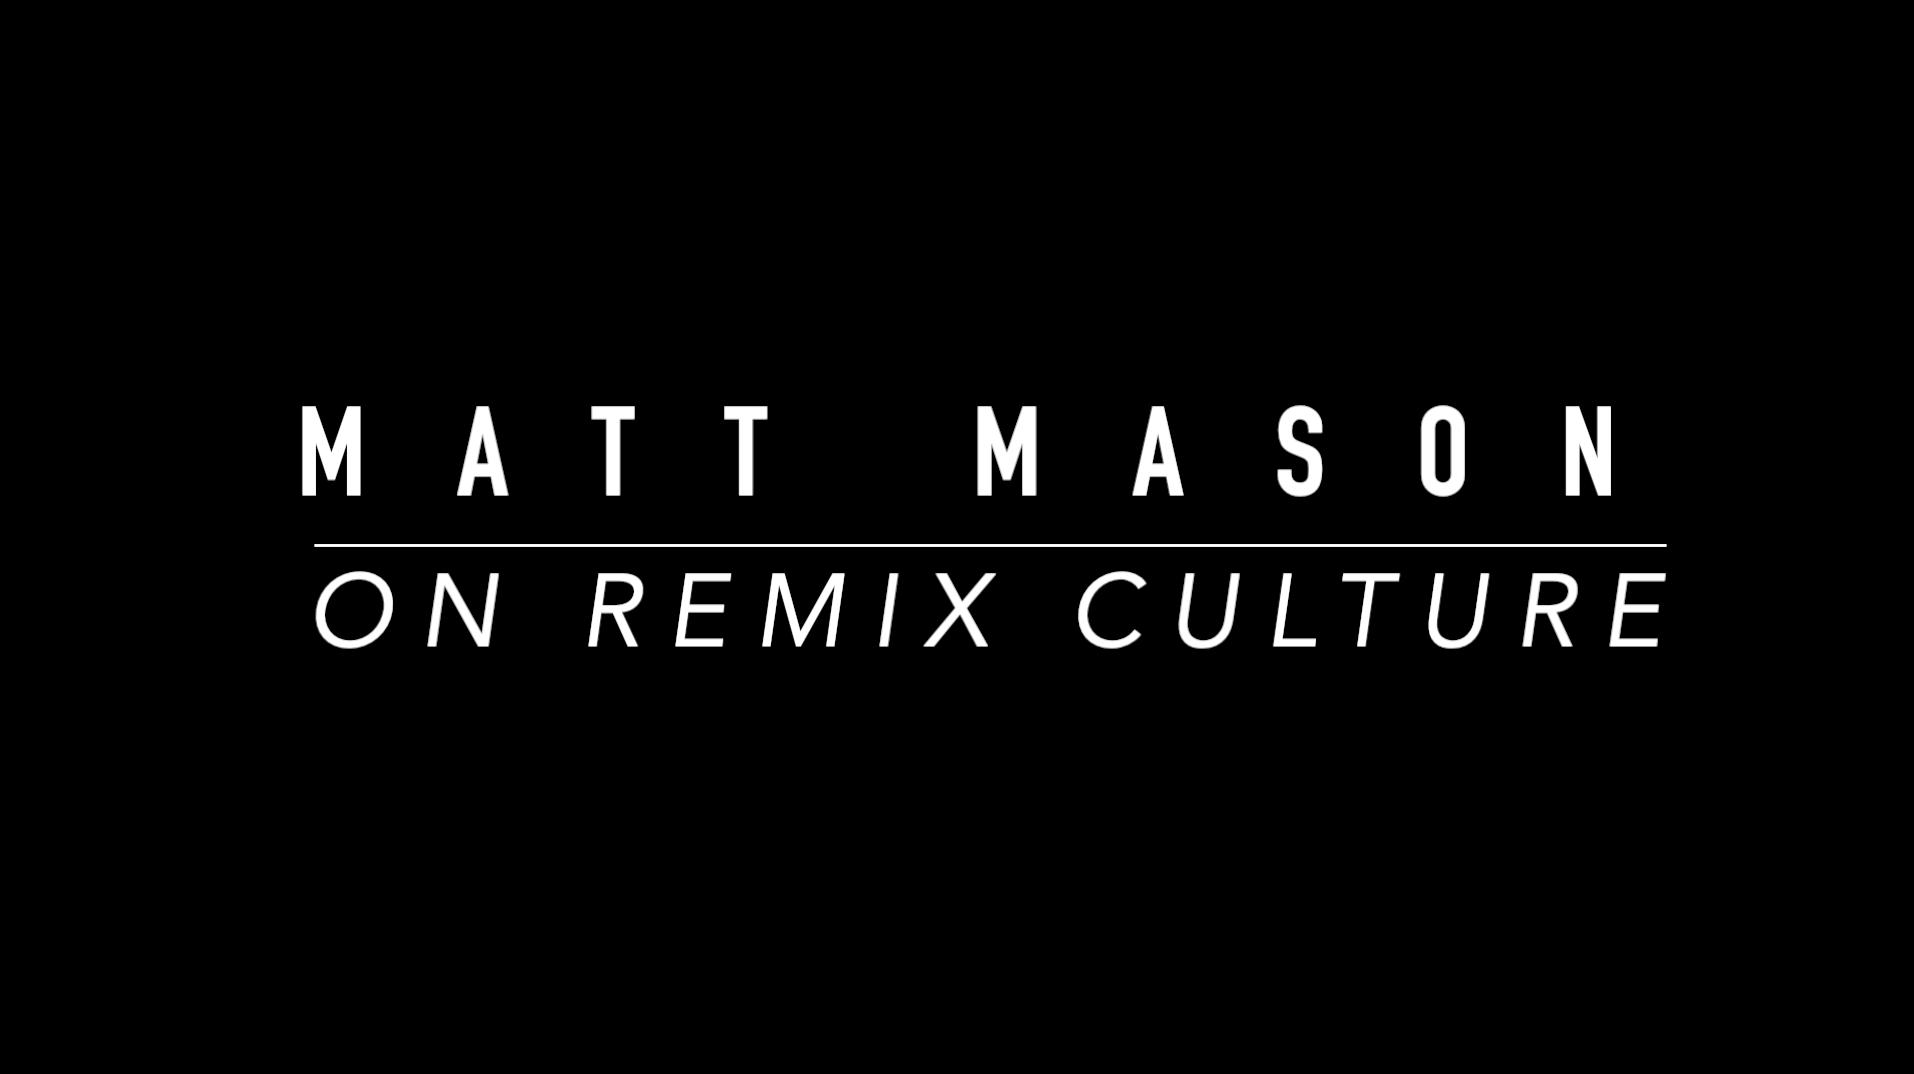 Matt Mason - Remix Culture